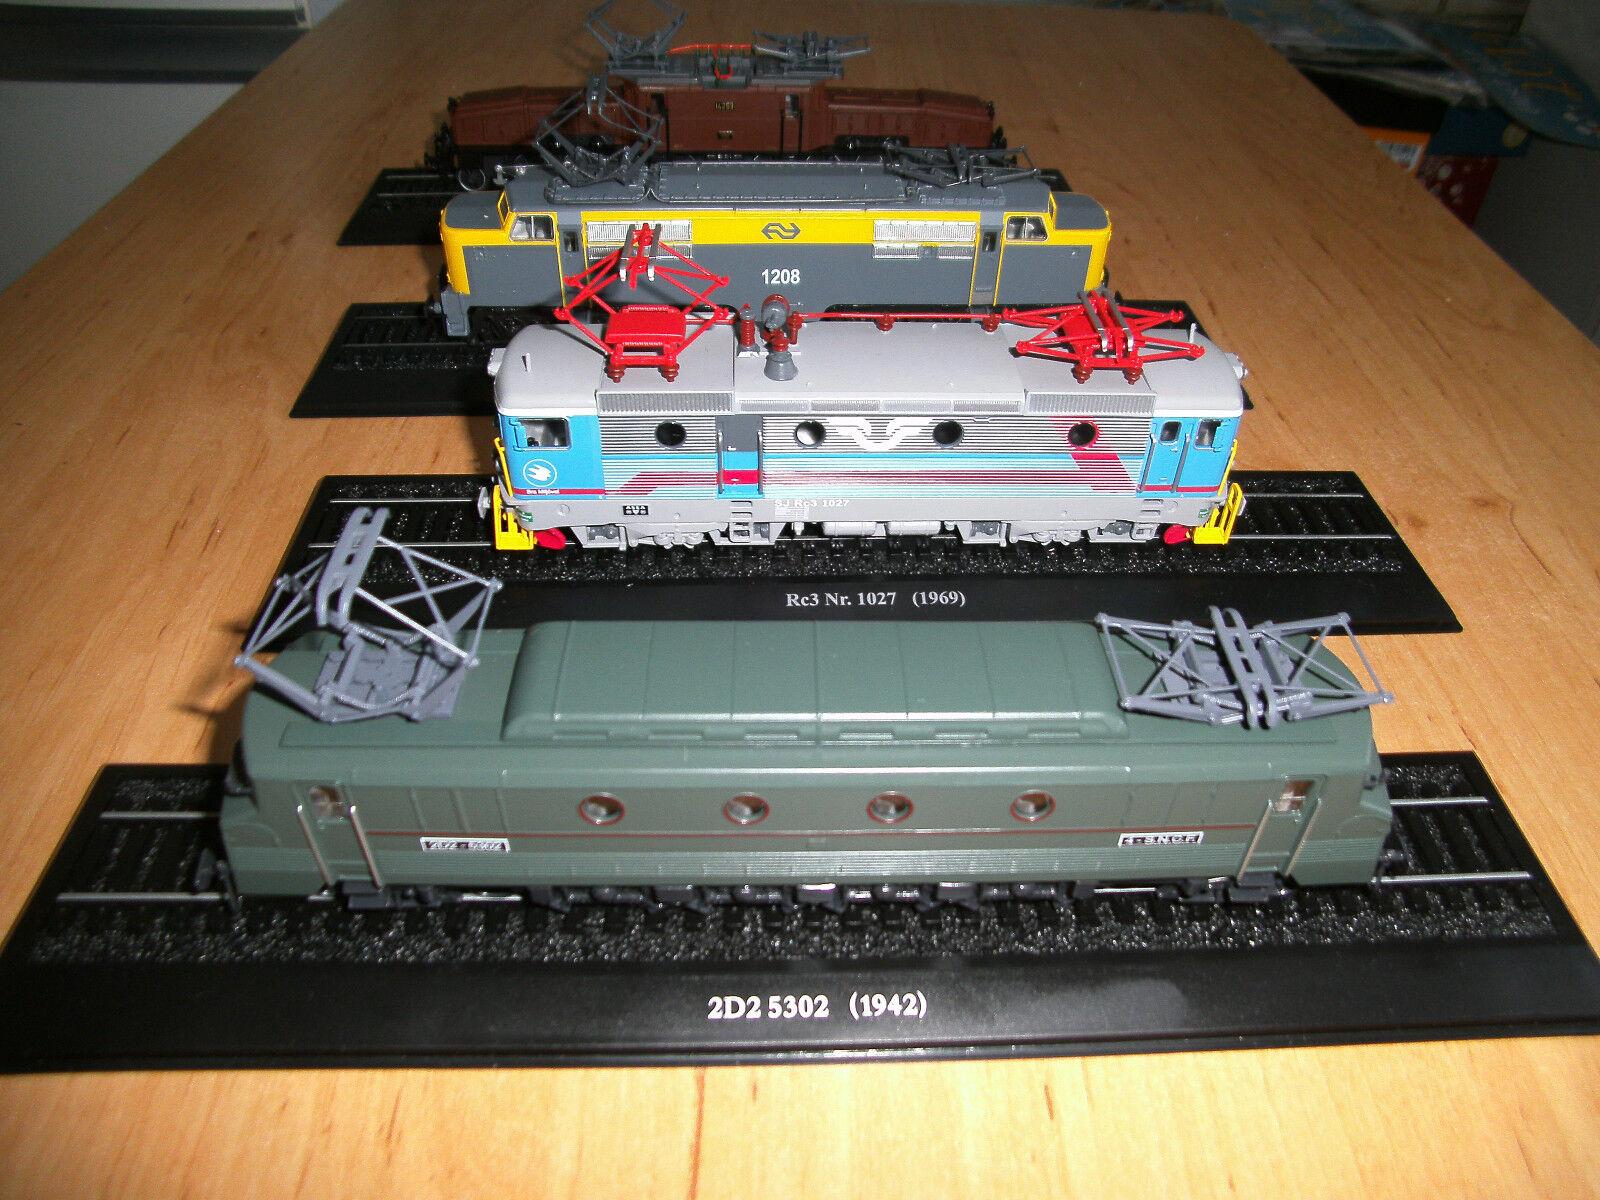 Venta en línea de descuento de fábrica 4 fecha modelos-locomotoras modelos-locomotoras modelos-locomotoras atlas Verlag  Esperando por ti